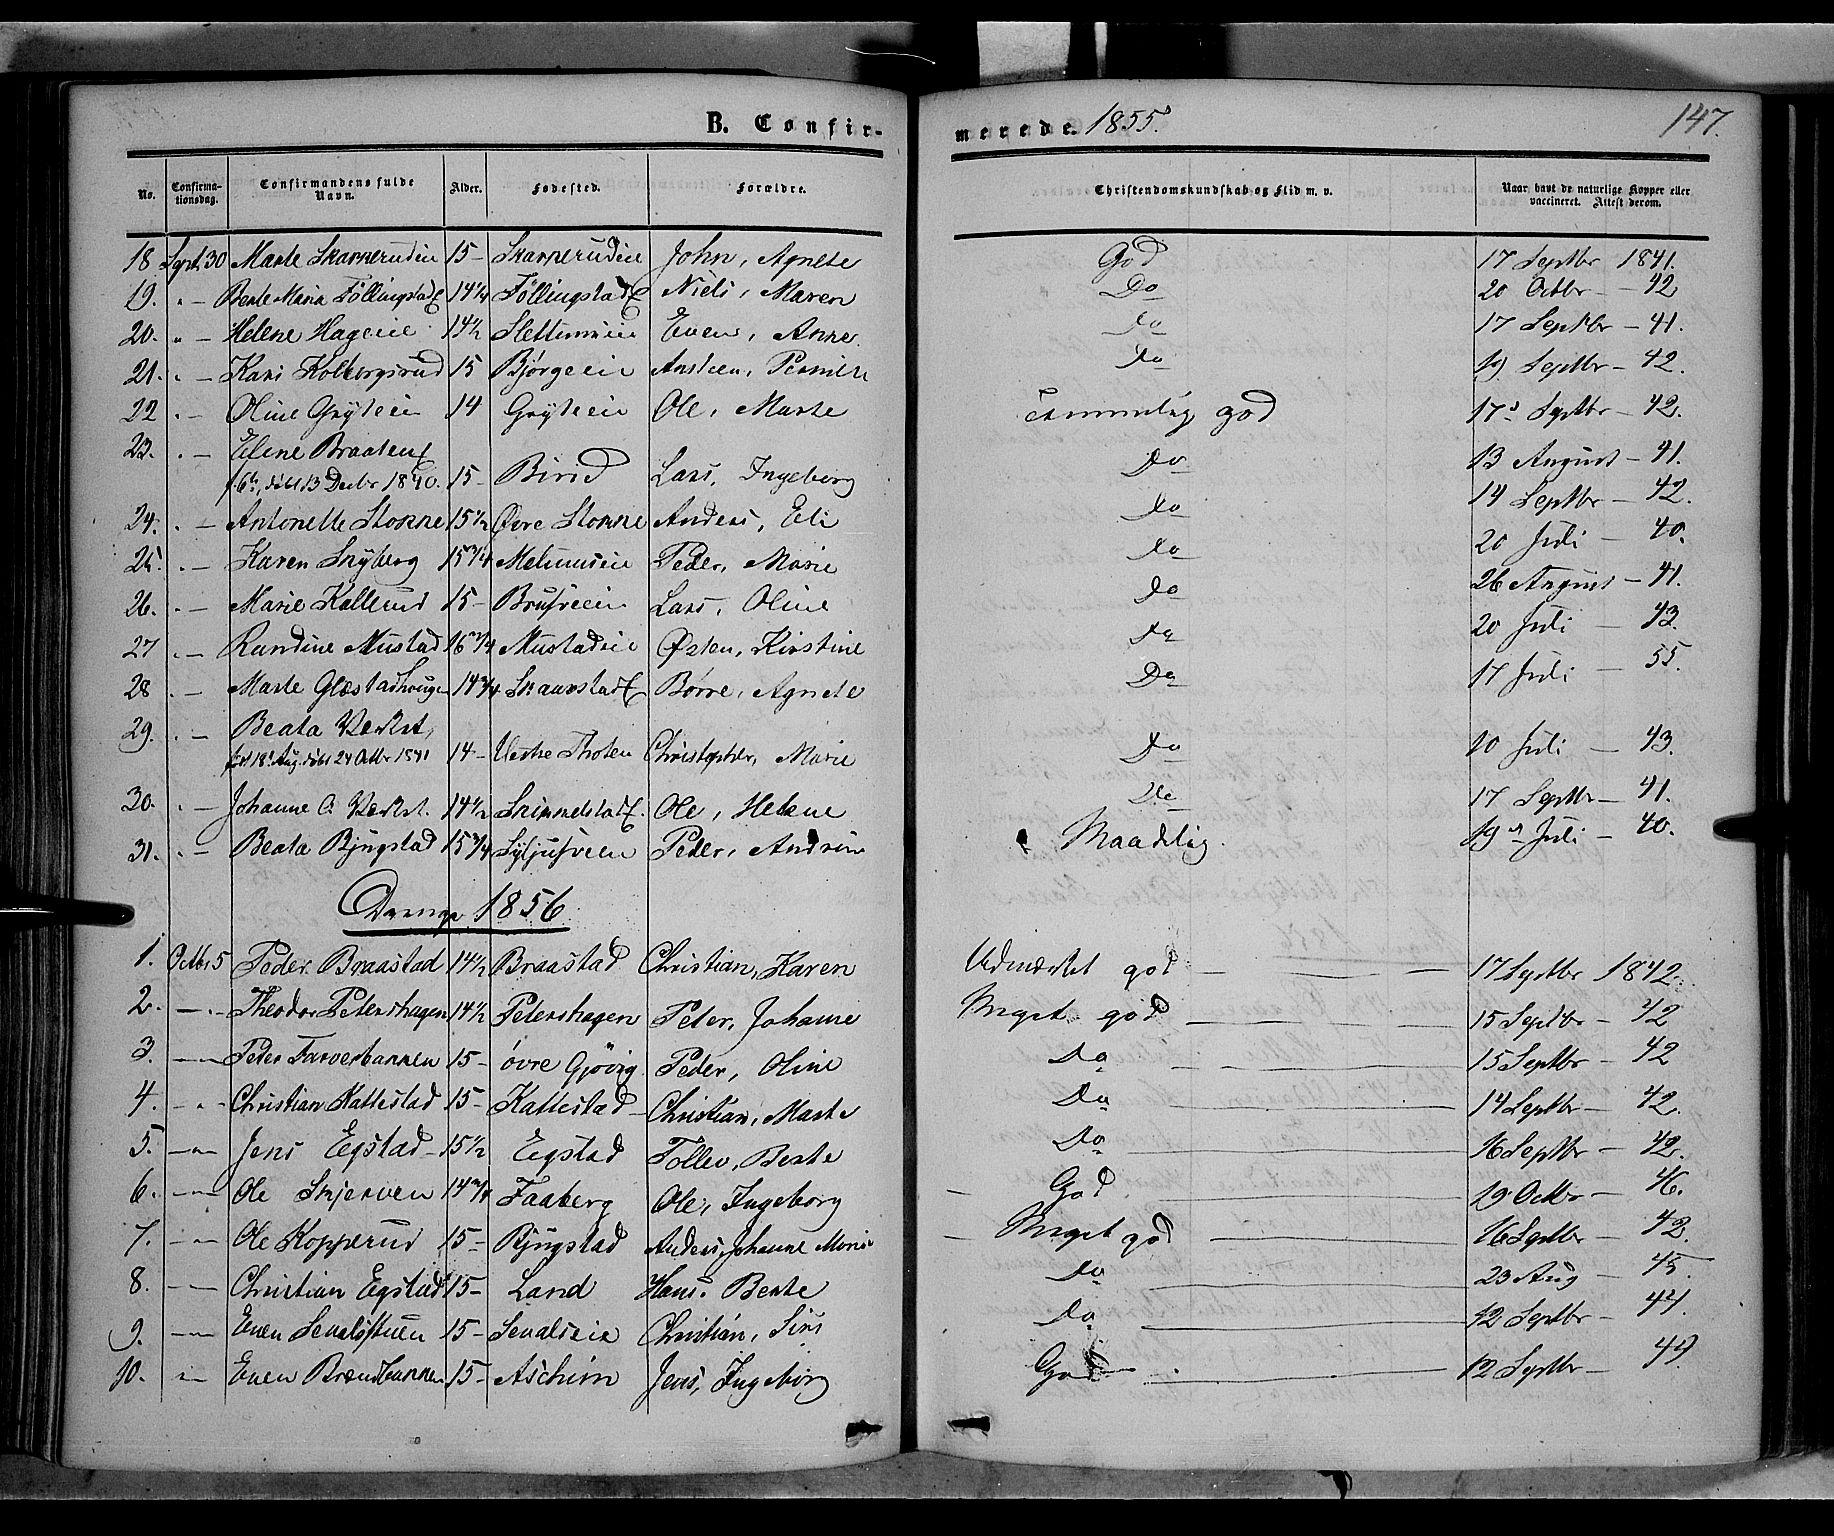 SAH, Vardal prestekontor, H/Ha/Haa/L0006: Ministerialbok nr. 6, 1854-1866, s. 147